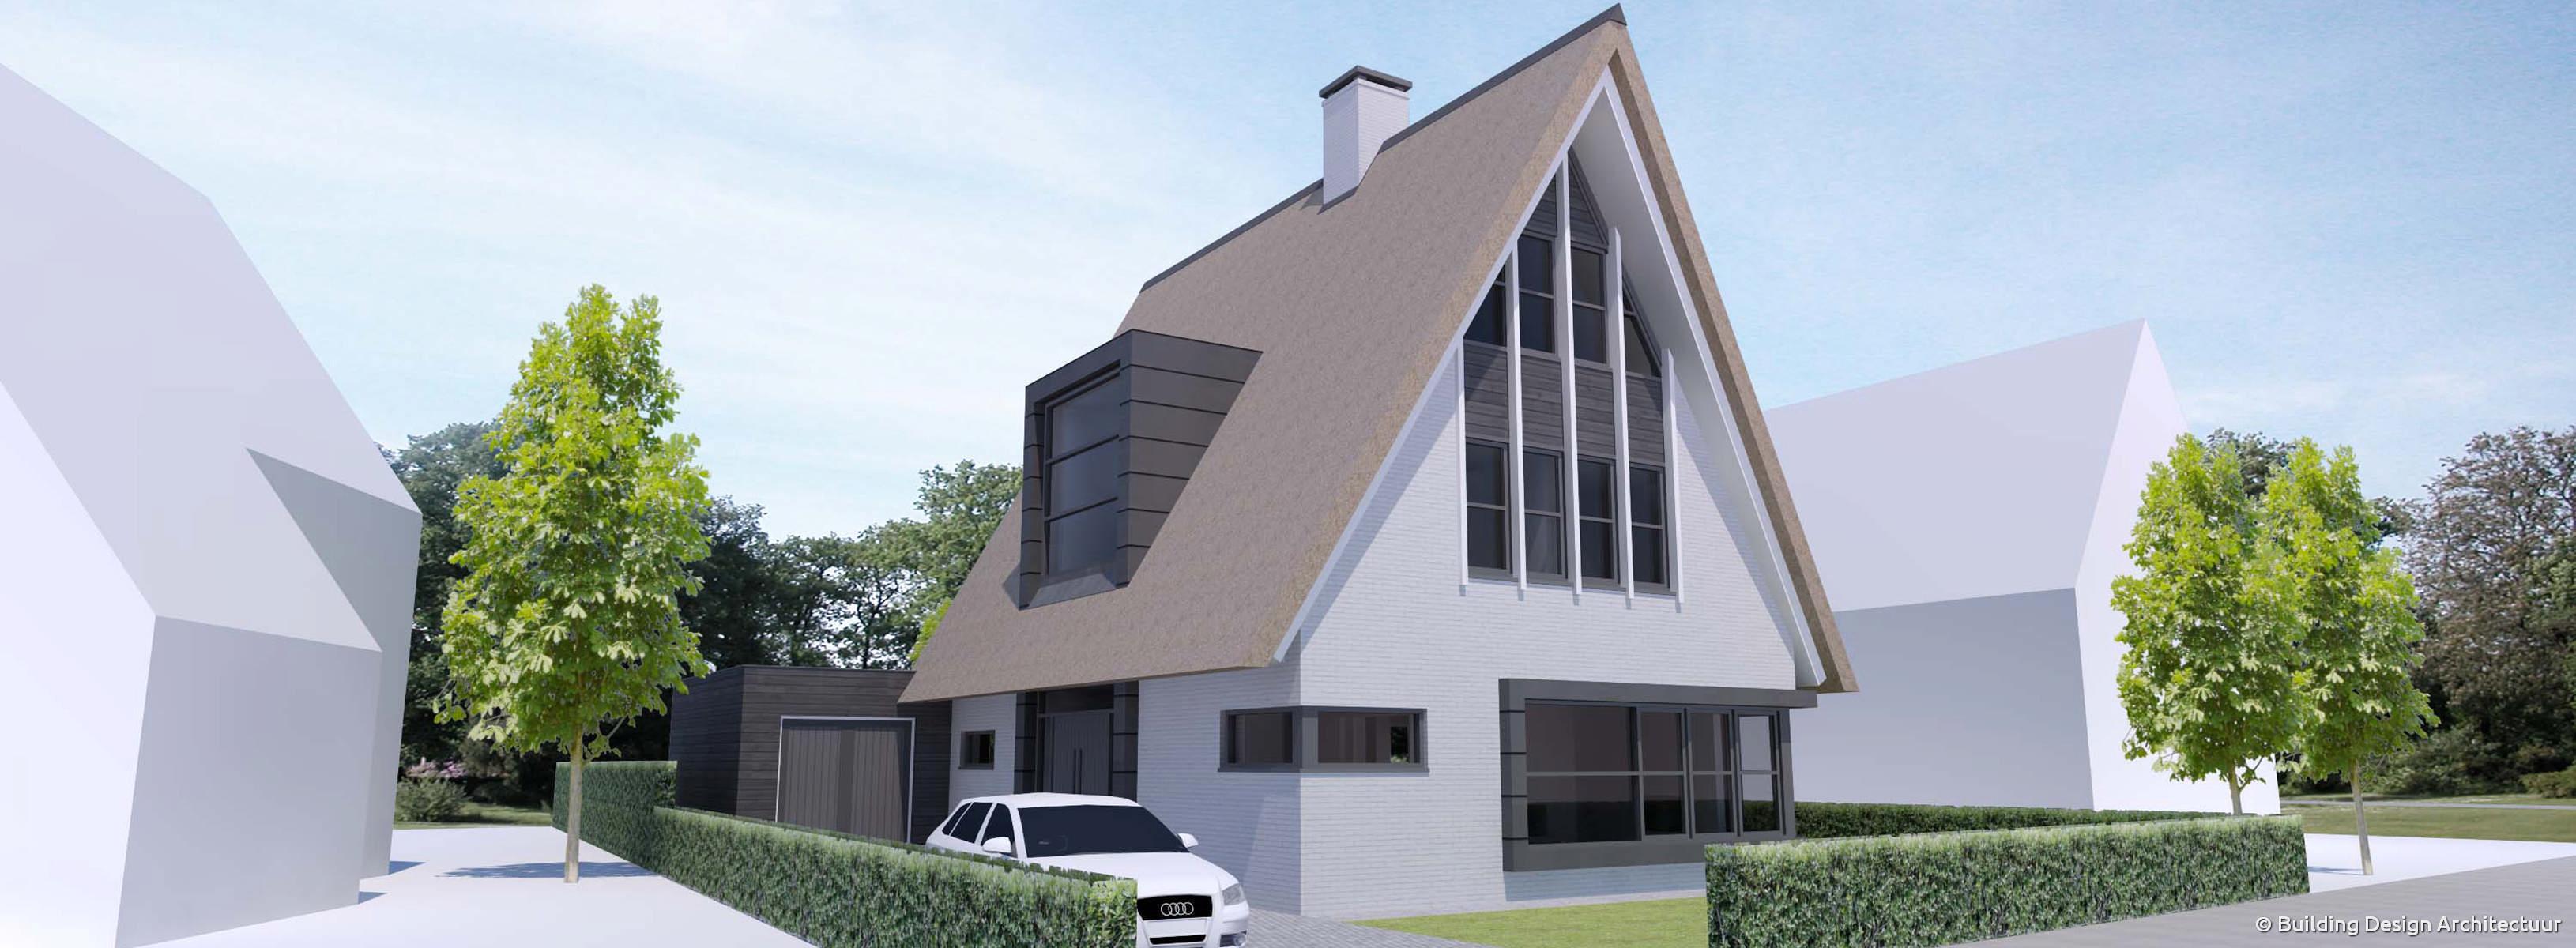 Building design architectuur - Eigentijdse design ingang ...